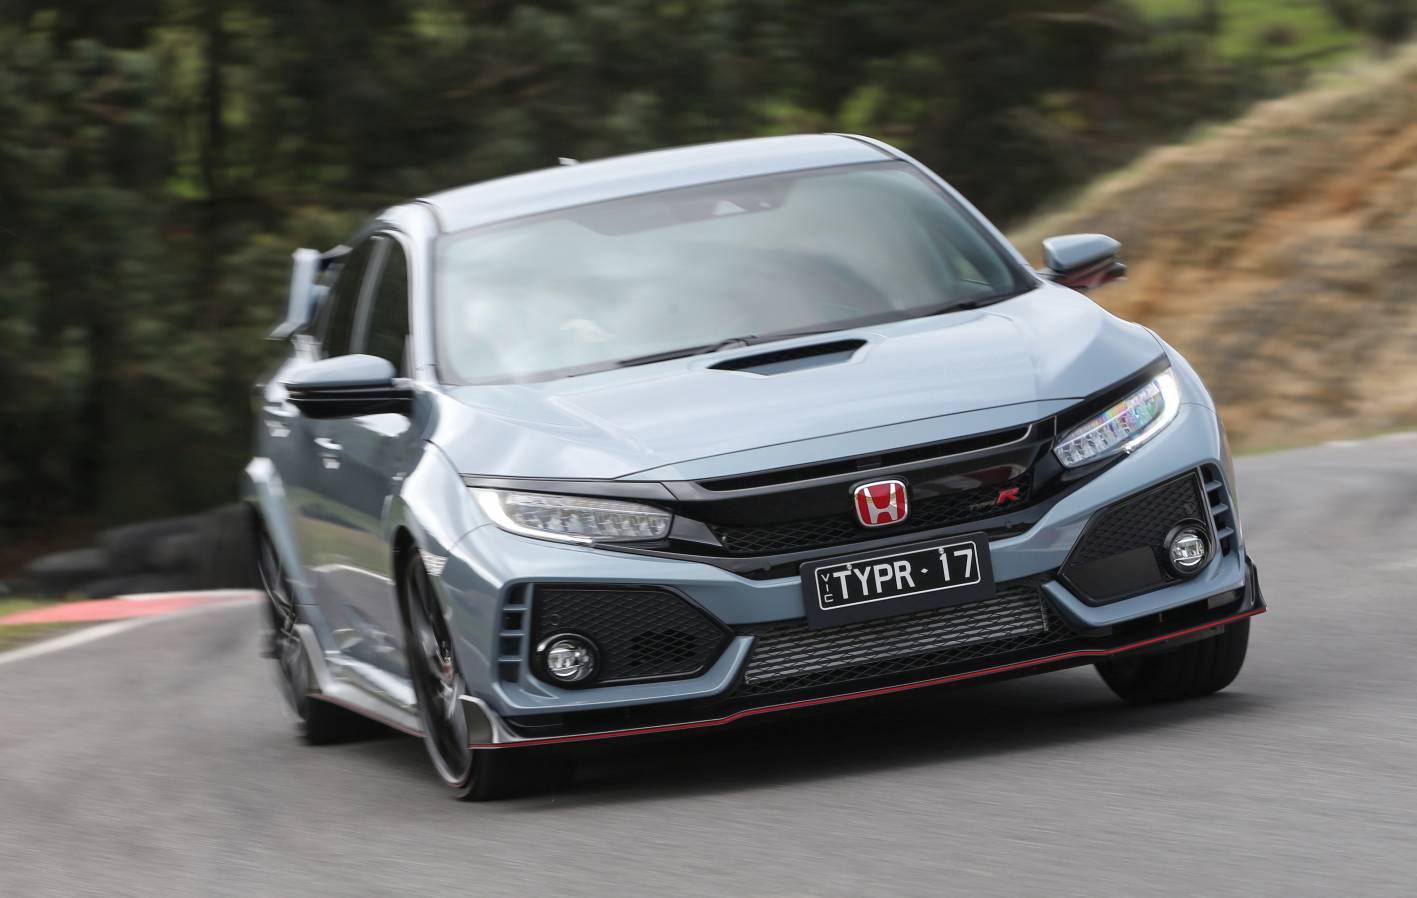 Honda Civic Type R- 1